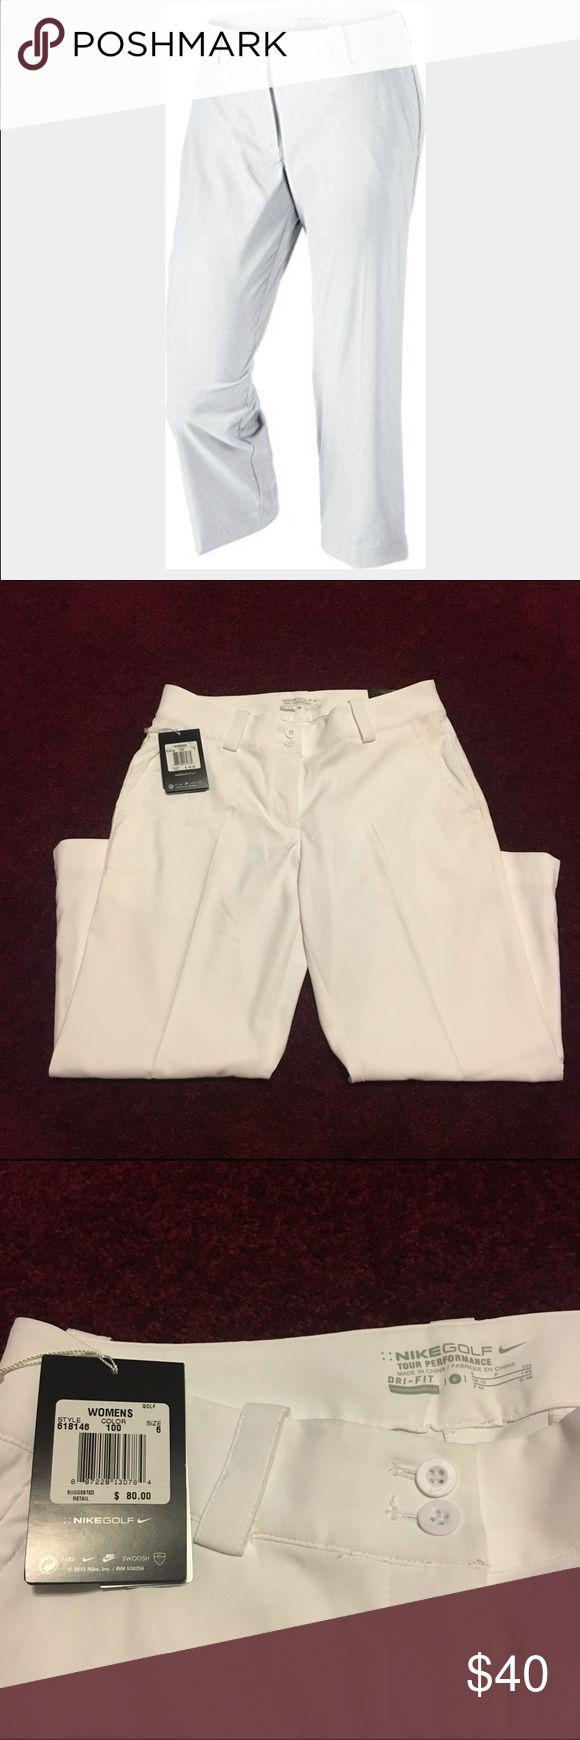 Nike golf cropped pant- women's pants/ capris Women's Nike golf cropped pant. Brand new with tags! Size 6! Feel free to make an offer! Nike Pants